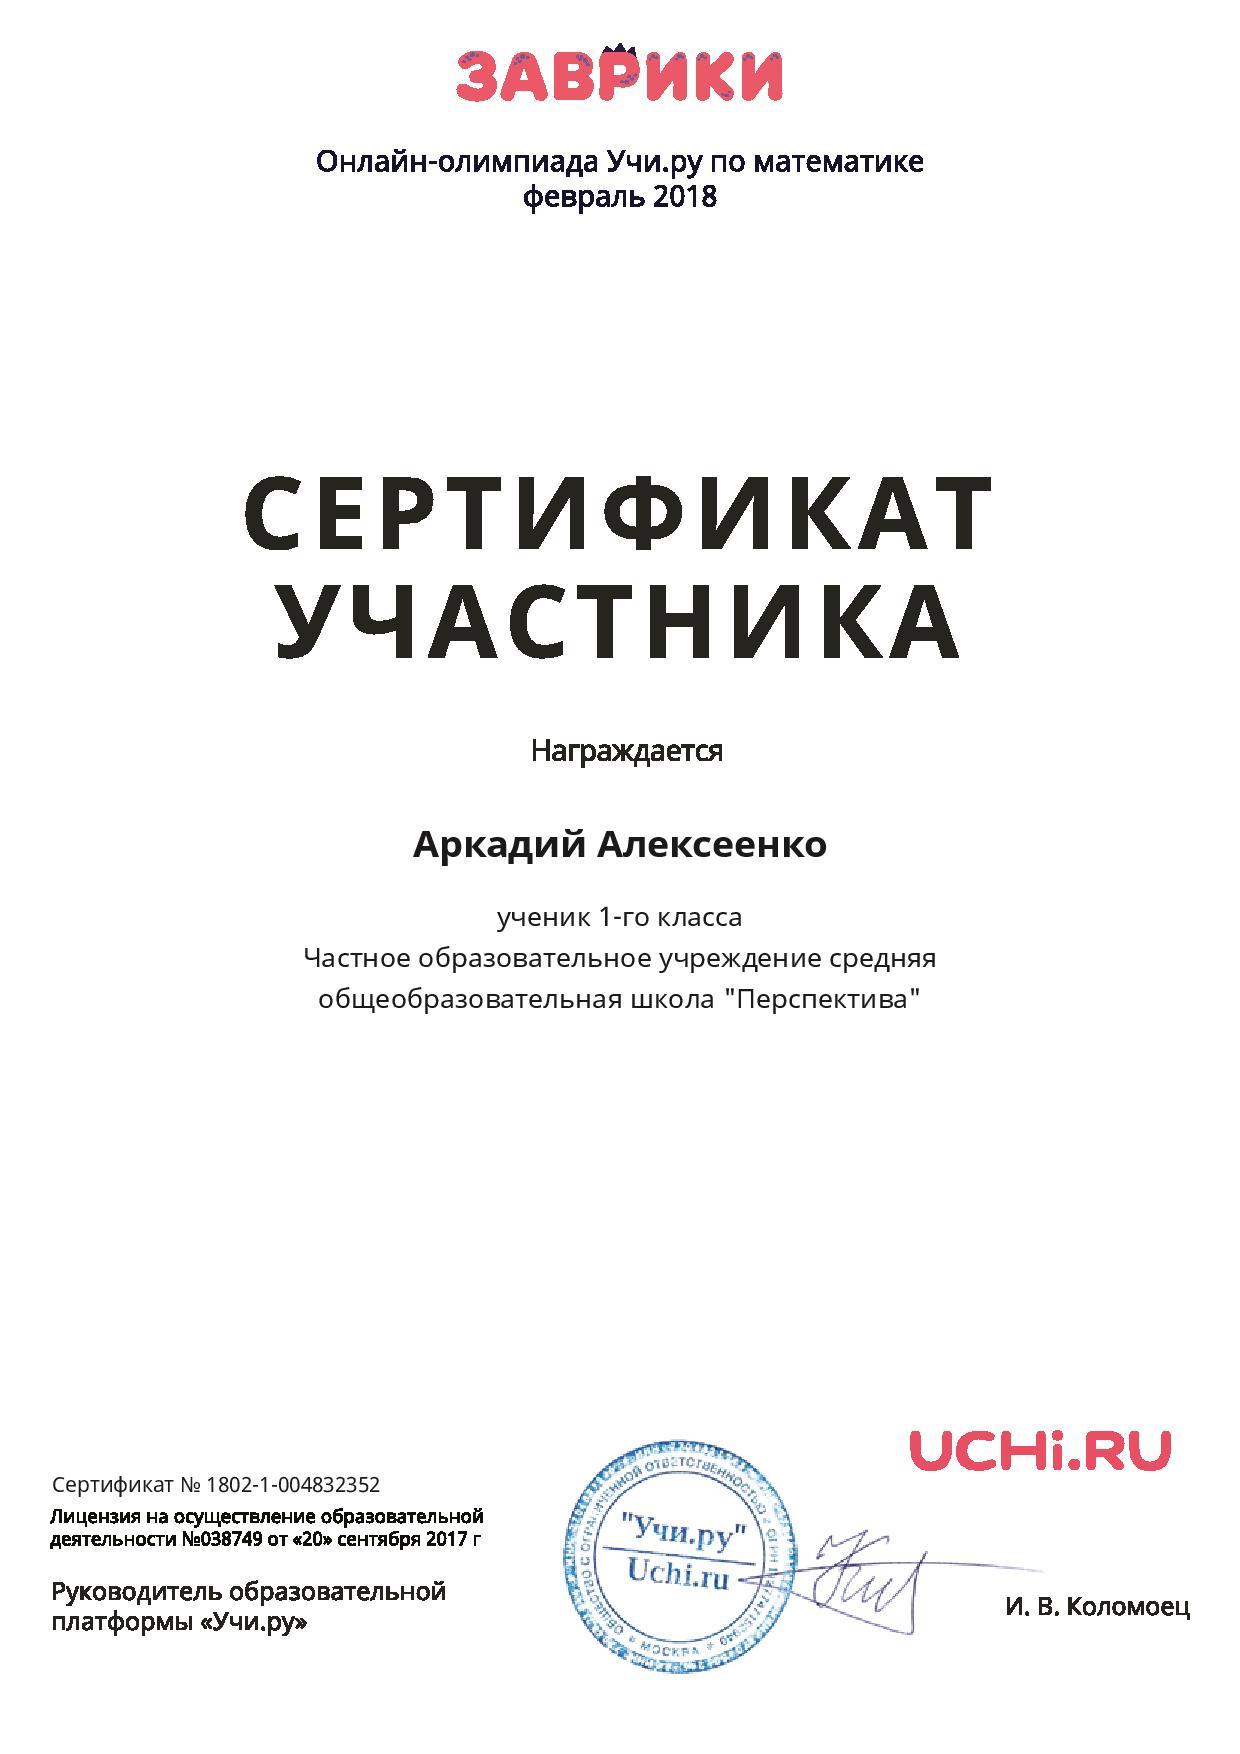 Sertifikat_Arkadiy_Alekseenko_5468971-page-001